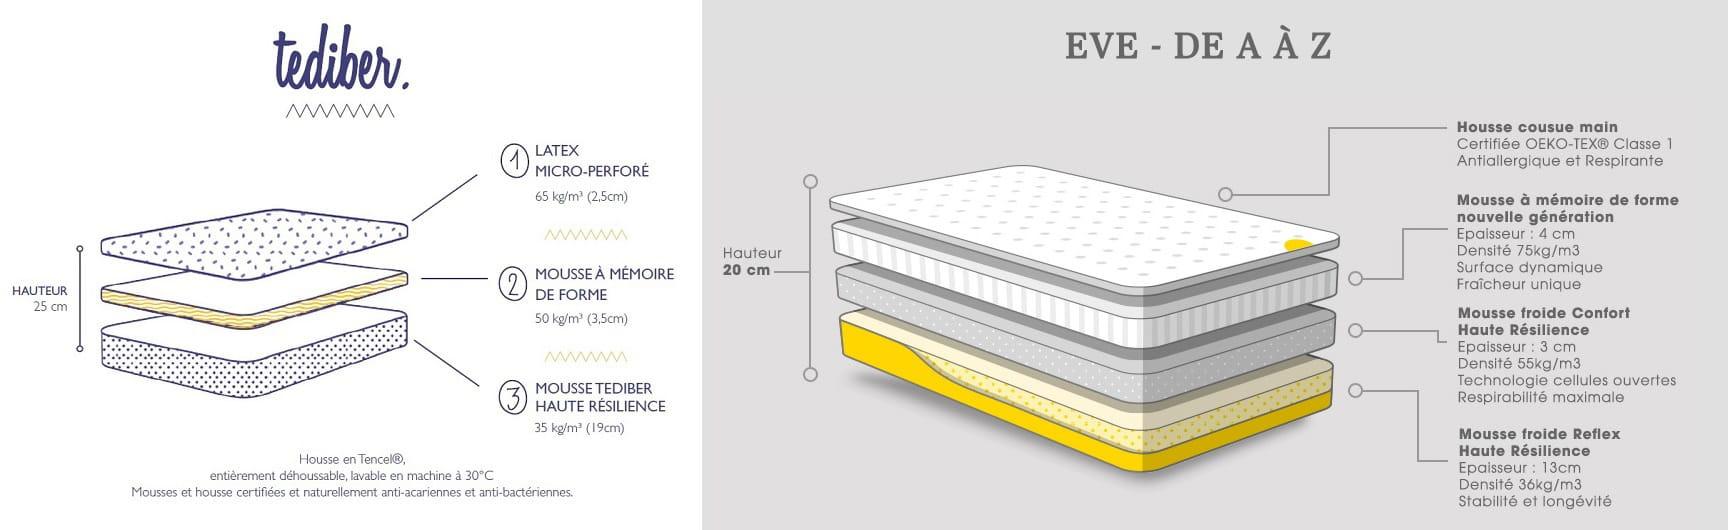 le boom des marques web de matelas arrive en france. Black Bedroom Furniture Sets. Home Design Ideas